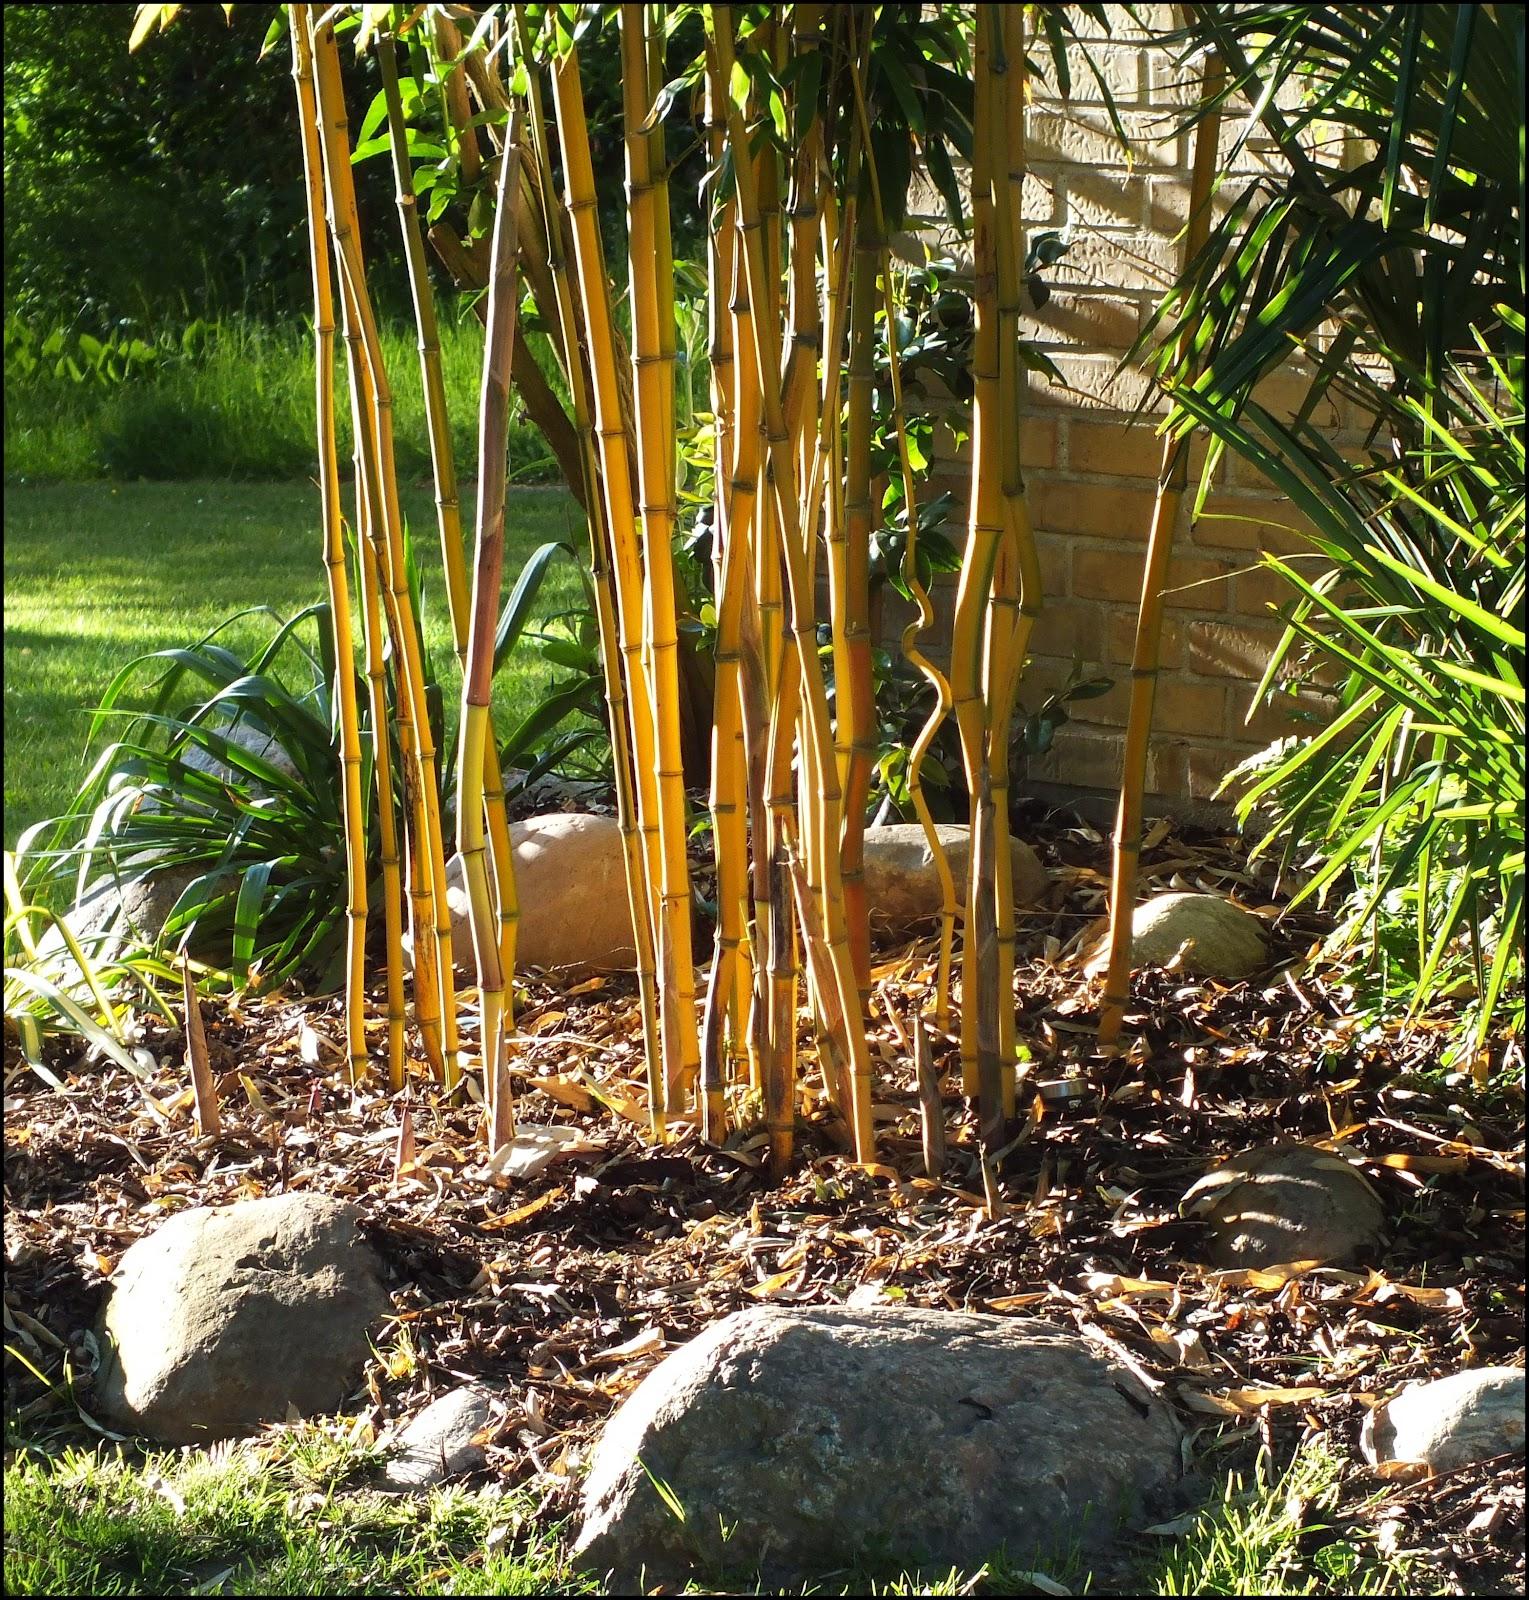 bambus kamelien yuccas mai 2012. Black Bedroom Furniture Sets. Home Design Ideas